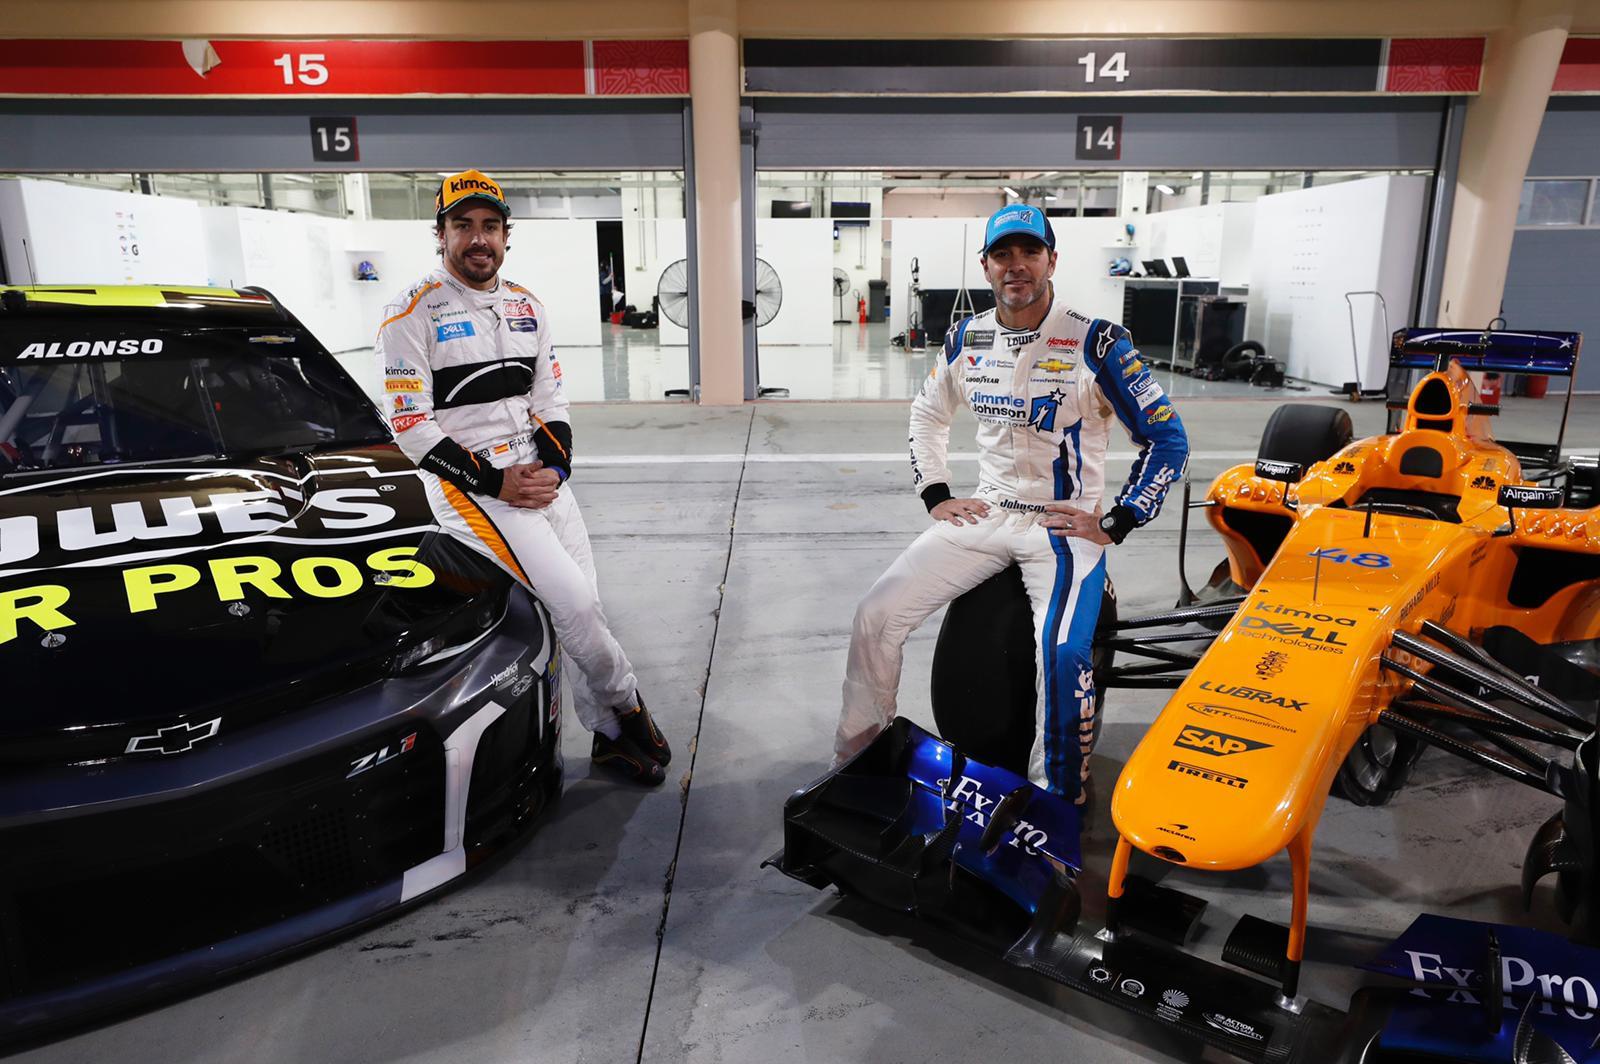 Fernando Alonso Jimmie Johnson car swap